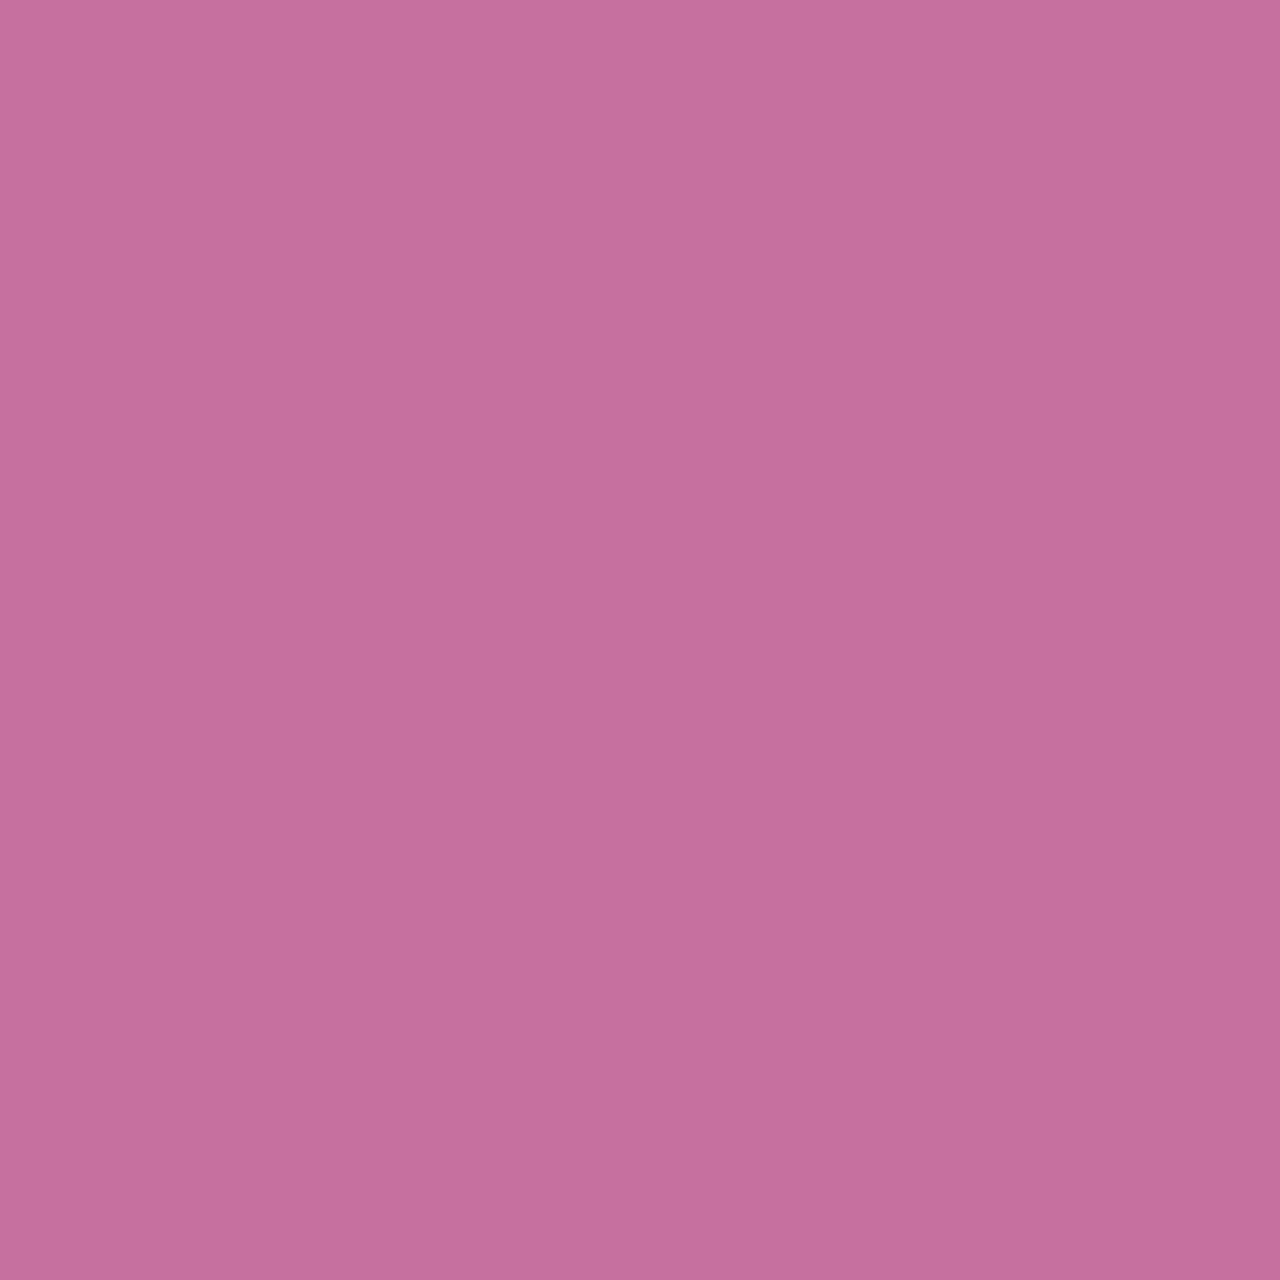 Rosco Cinegel 3313 Tough 1//2 Minusgreen Gel 48 x 25 Roll